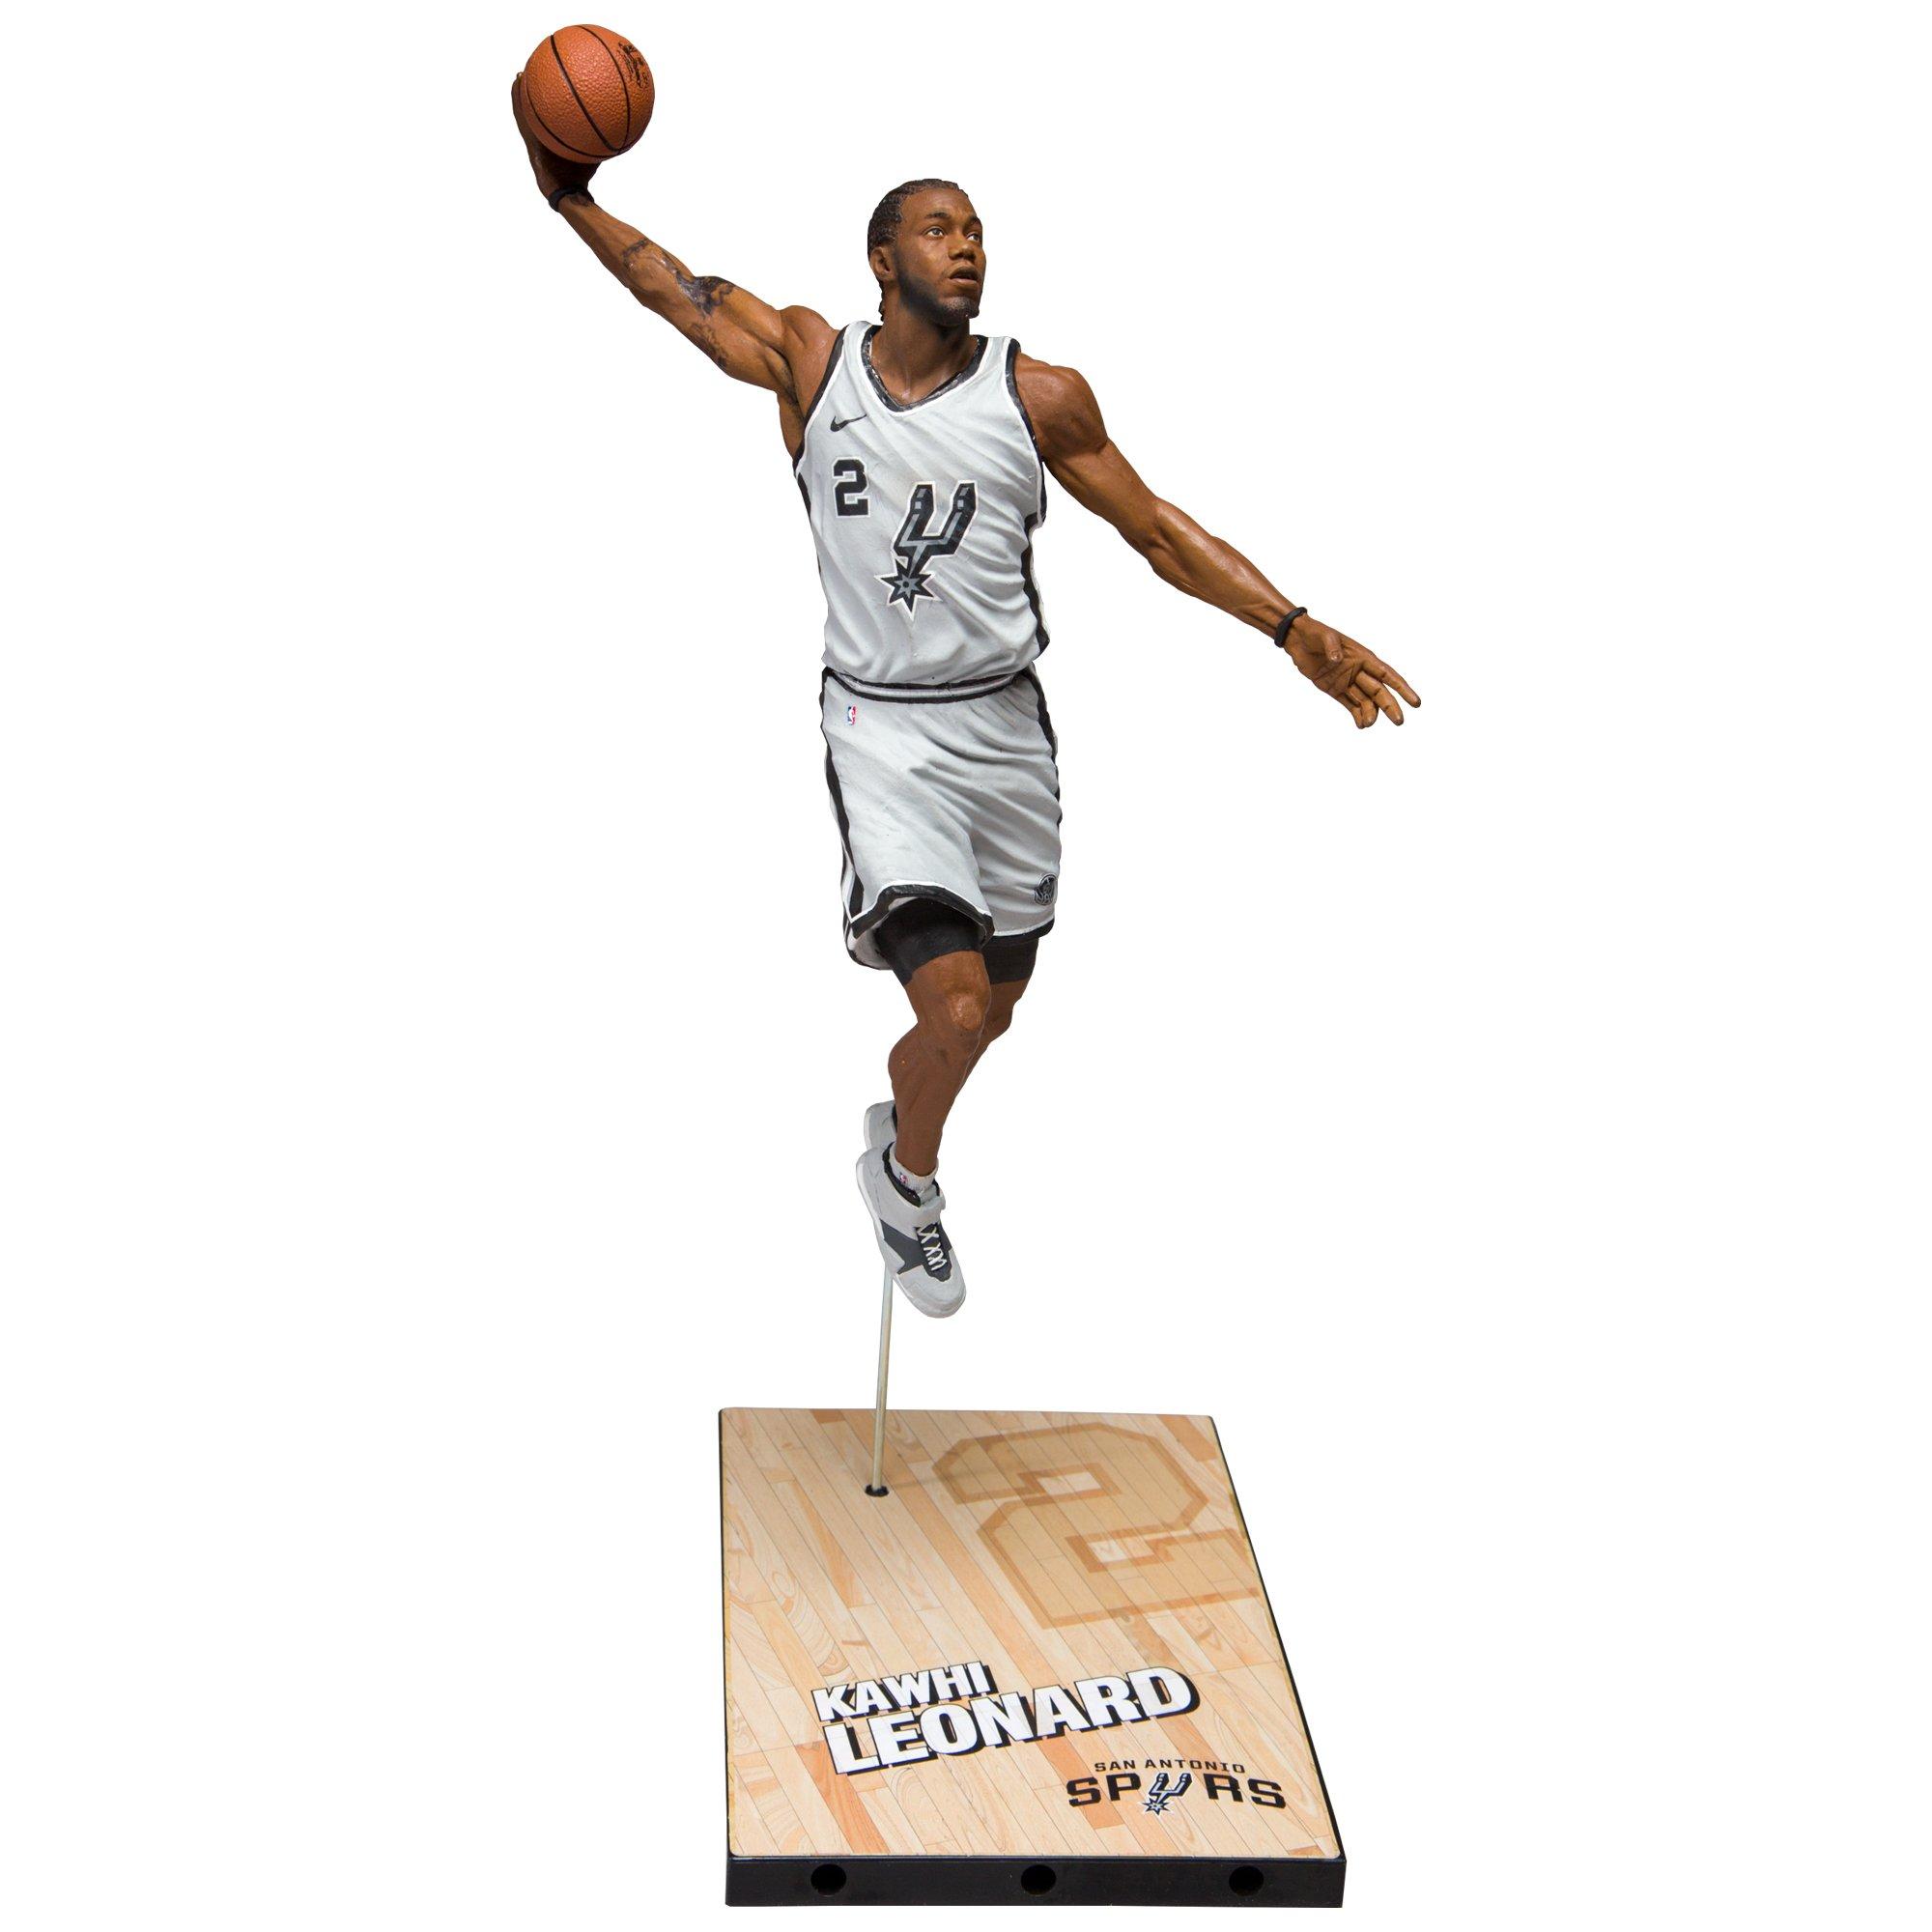 McFarlane Toys Nba Series 31 Kawhi Leonard San Antonio Spurs Action Figure by McFarlane